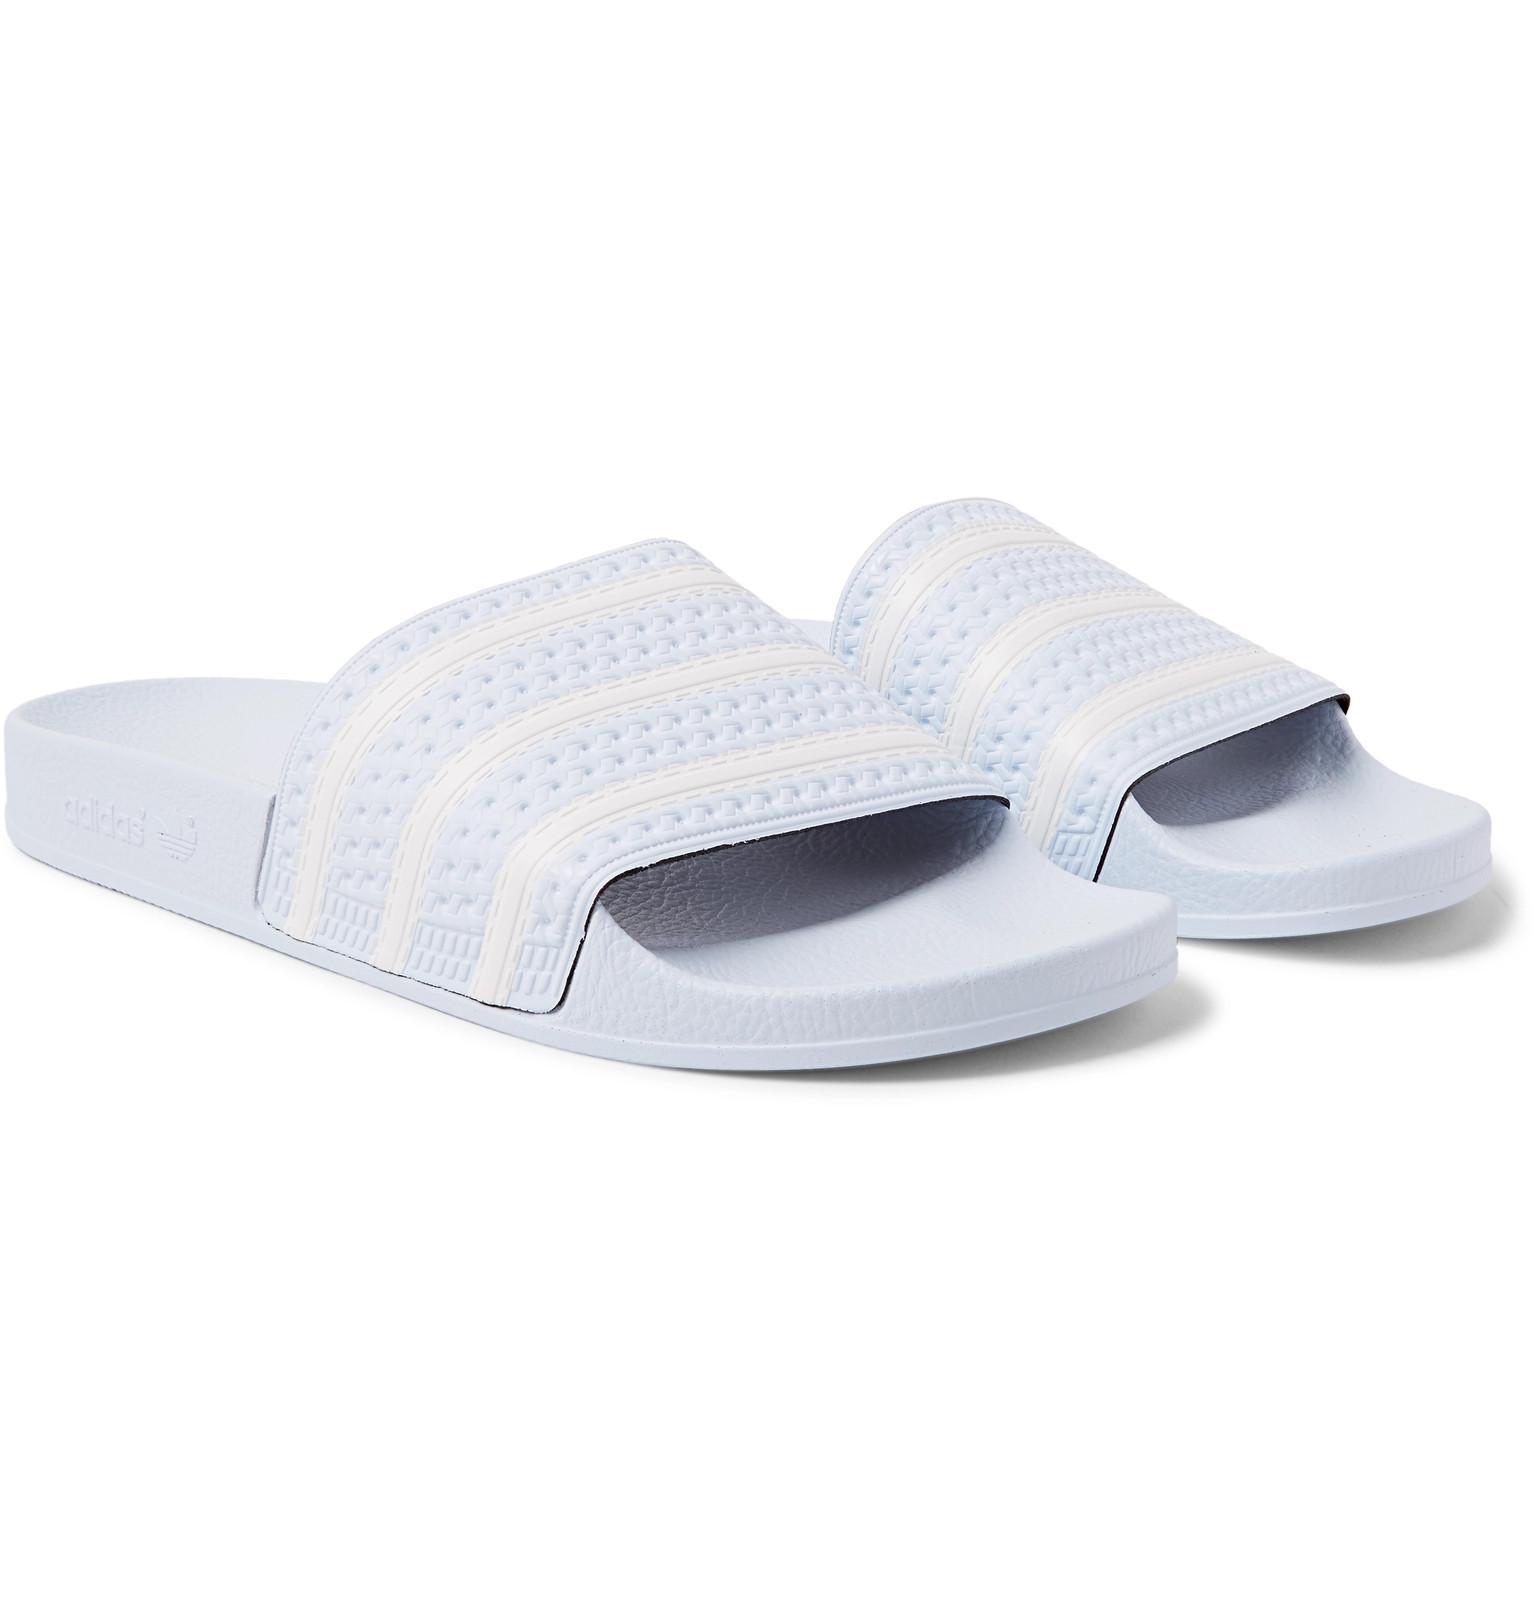 bb392d35f18281 Adidas Originals Adilette Textured-rubber Slides in Blue for Men - Lyst